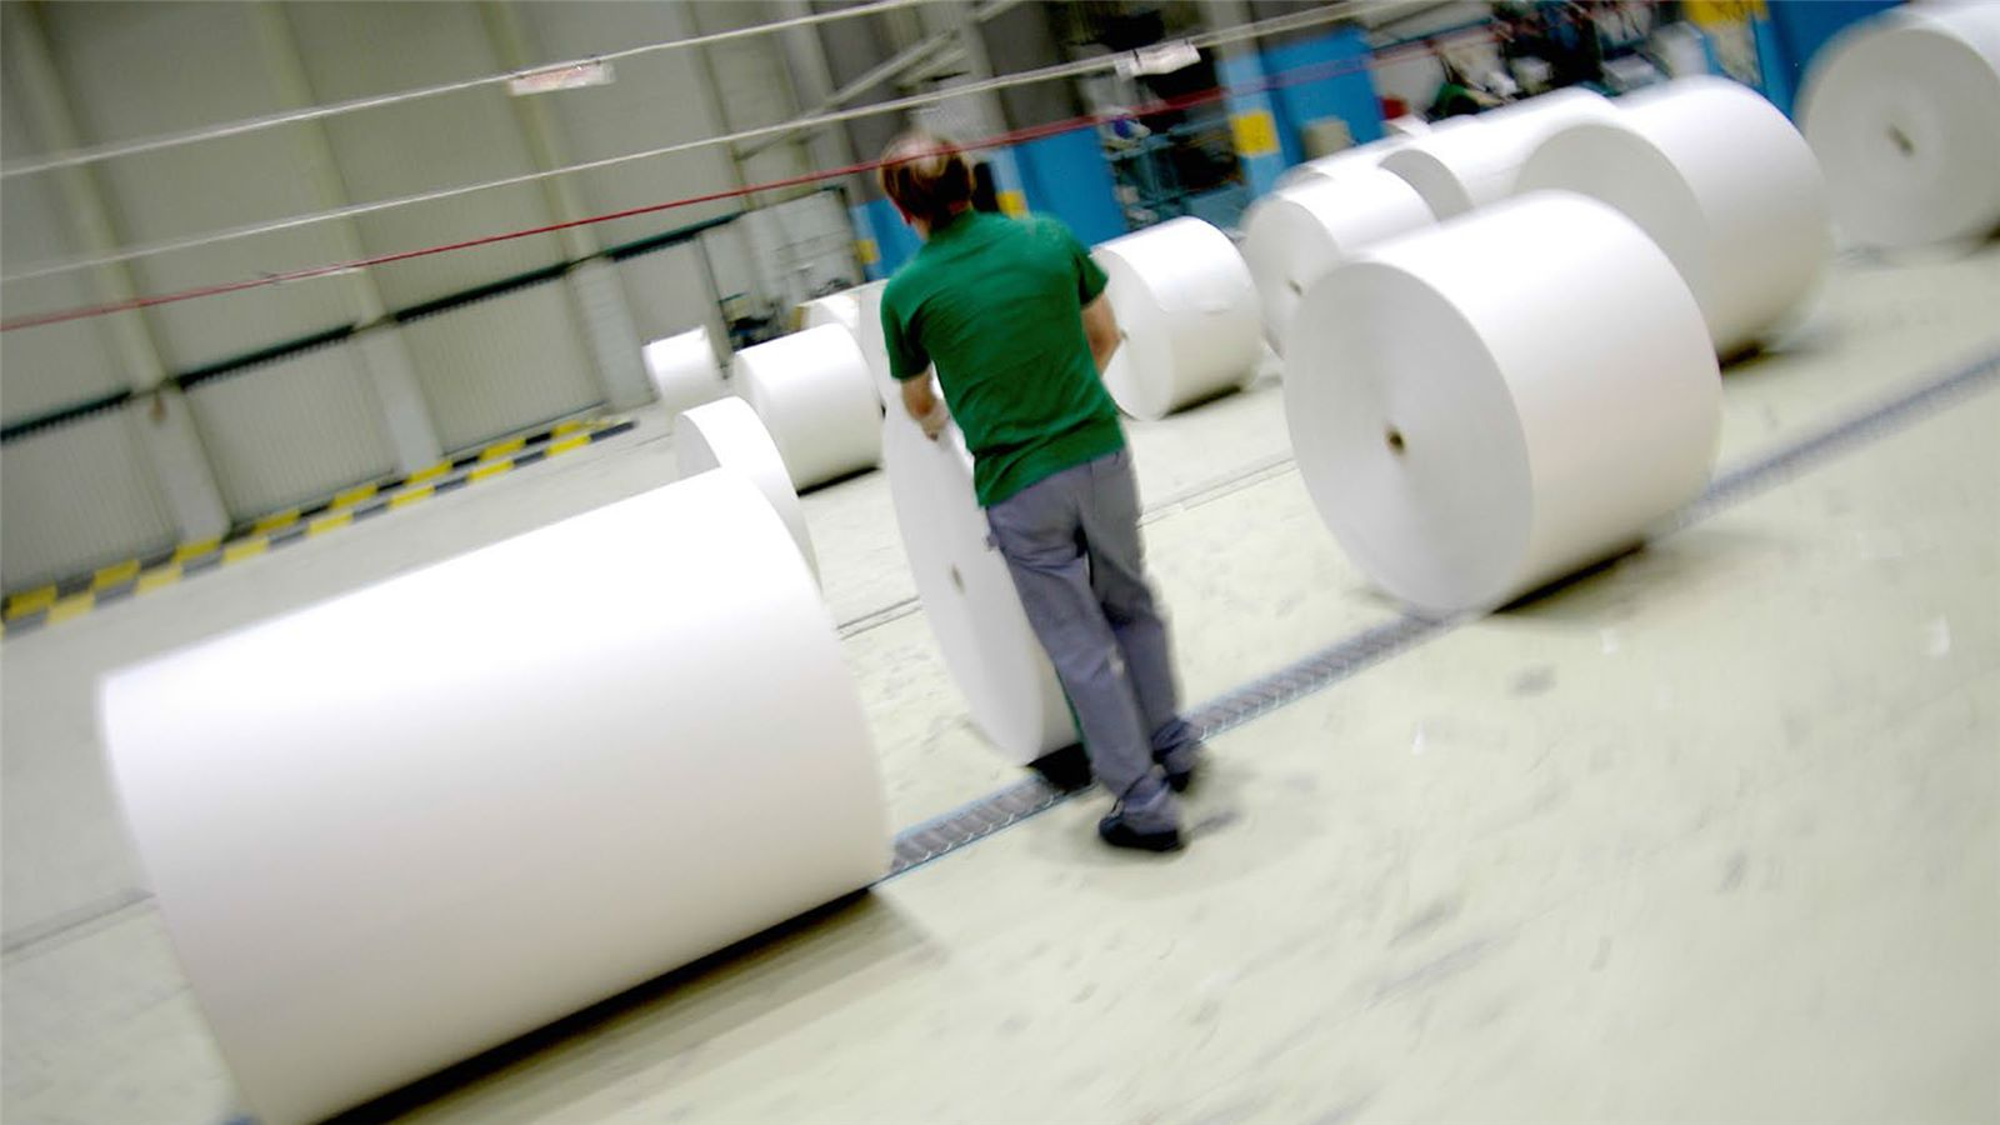 Smurfit Kappa paper mill resources optimization